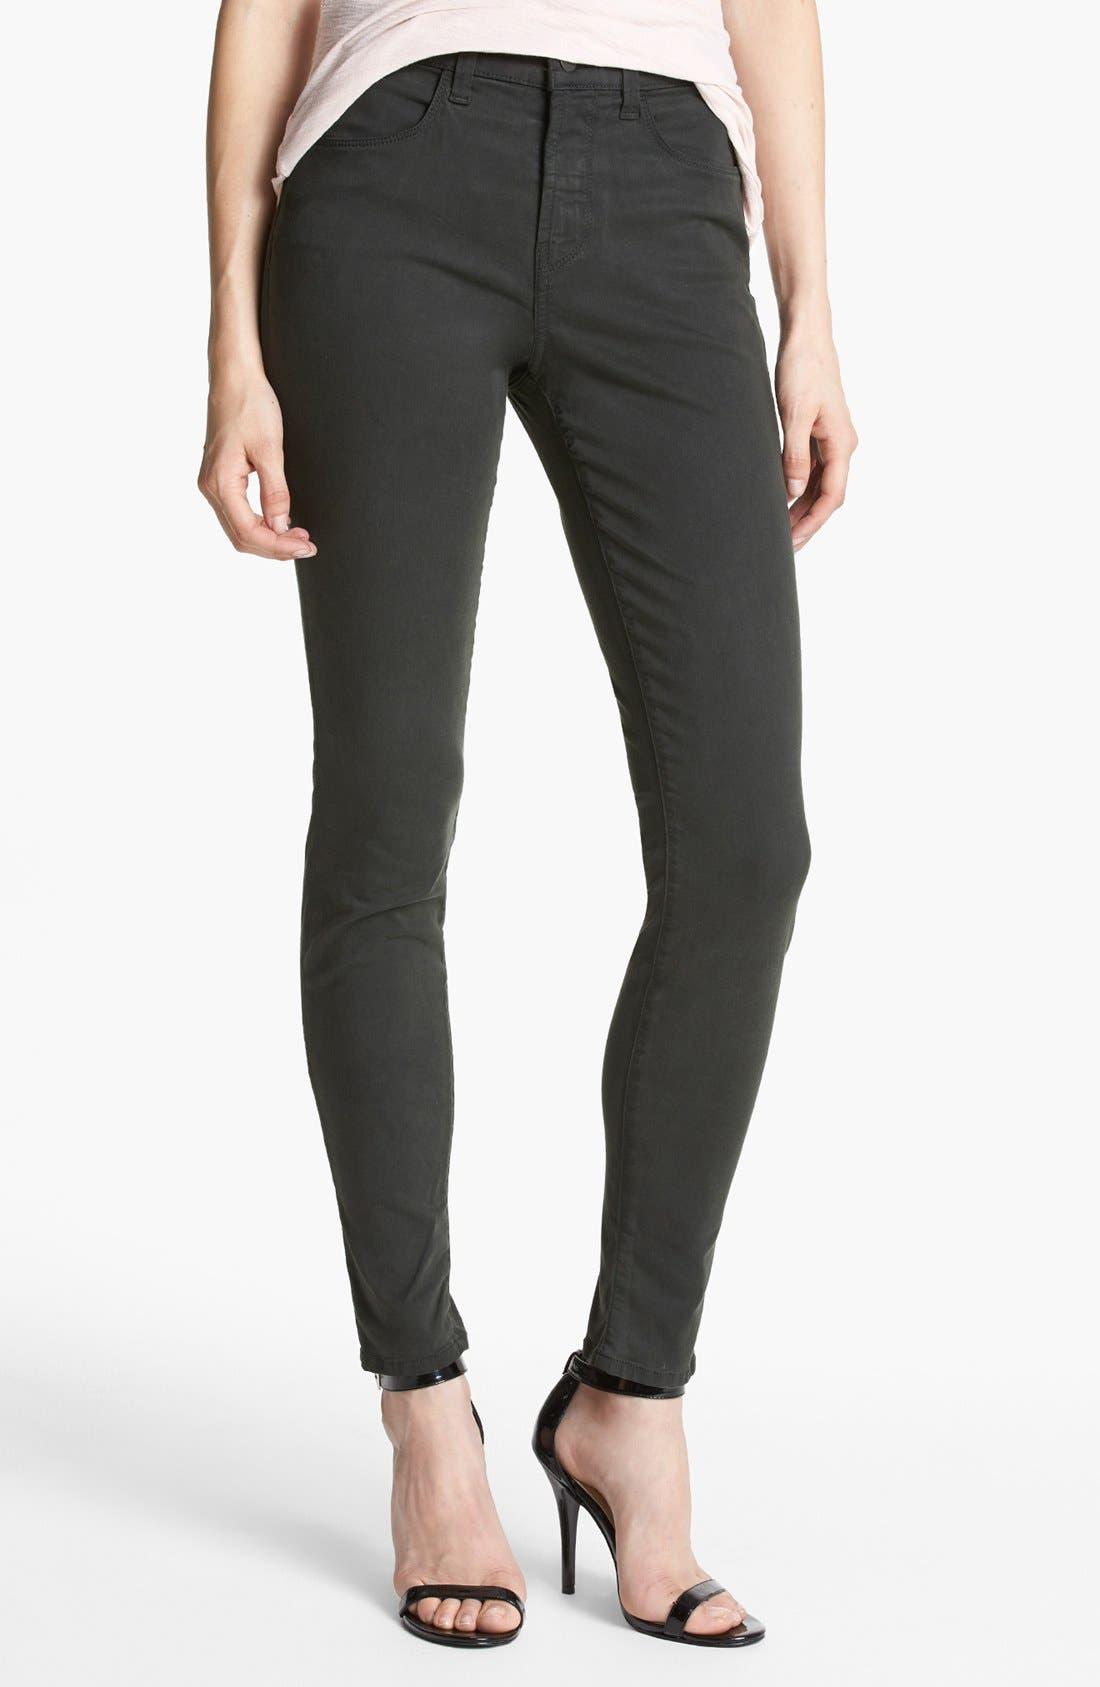 Alternate Image 1 Selected - J Brand 'Maria 2311' High Rise Skinny Jeans (Presidio)